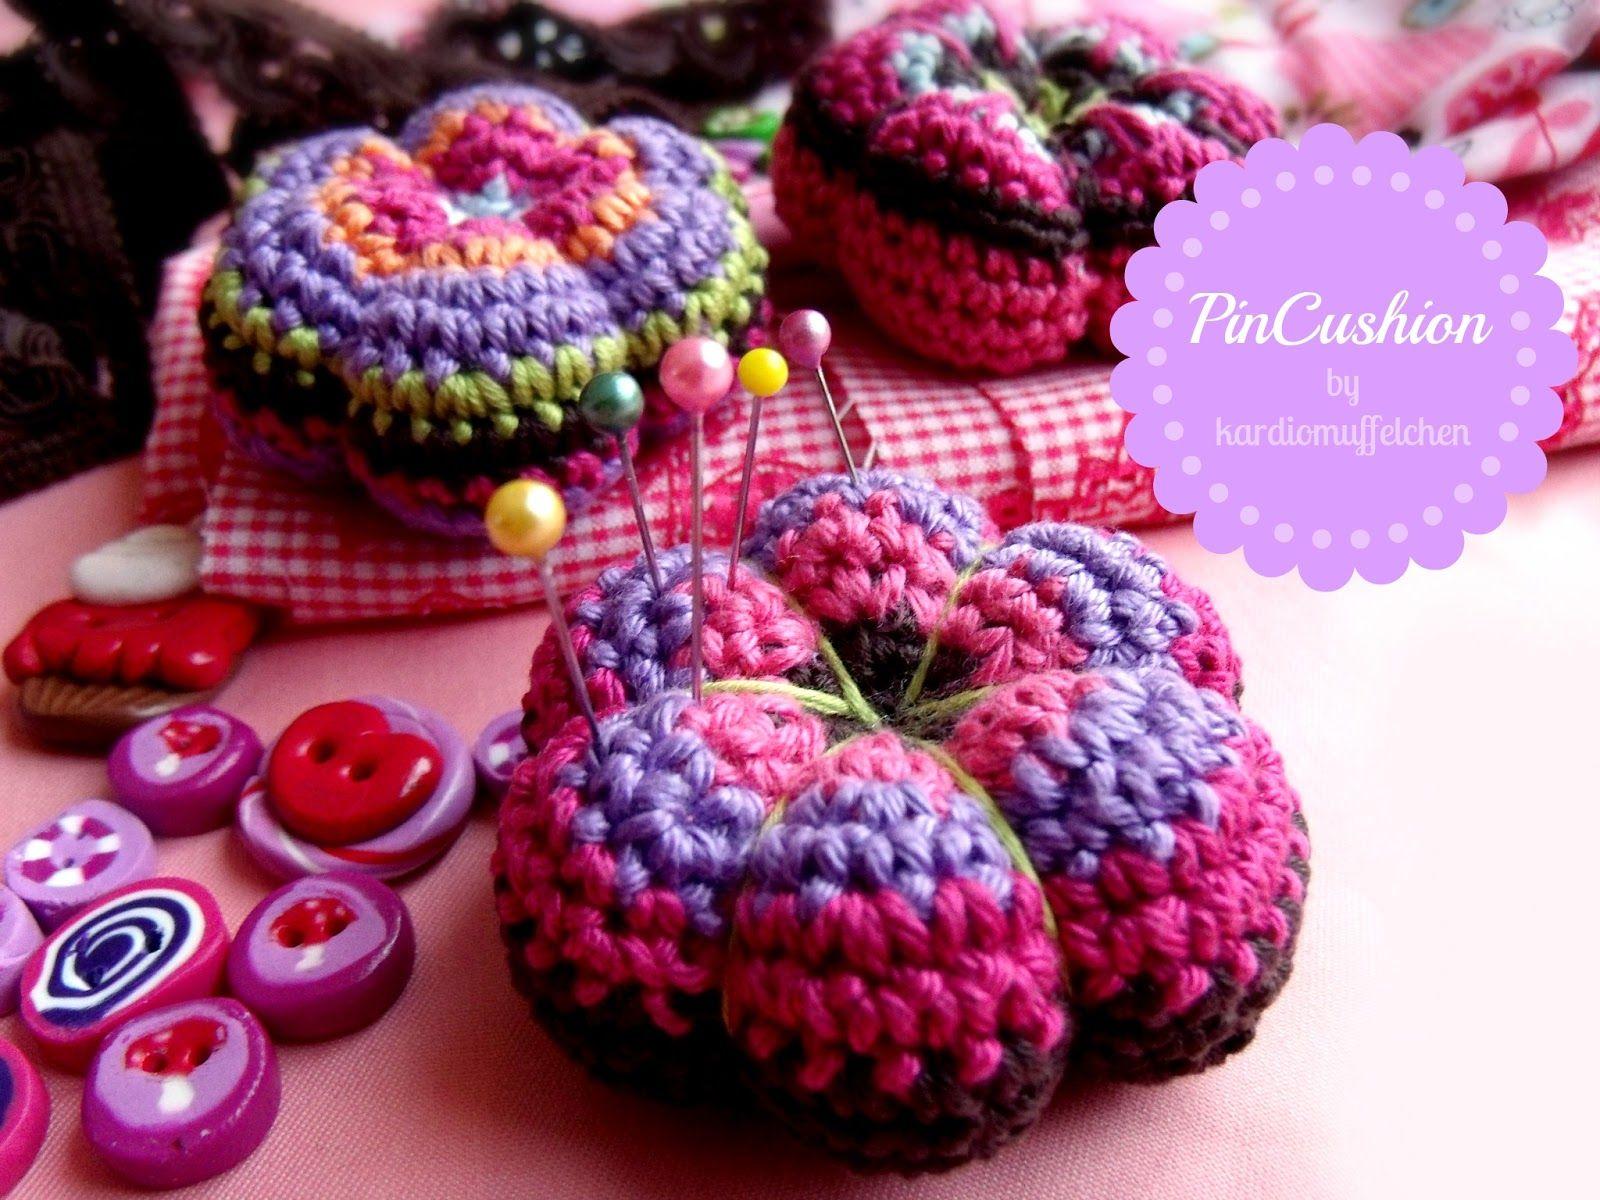 Retro Flower Pincushion Crochet Pattern | Crochet | Pinterest ...